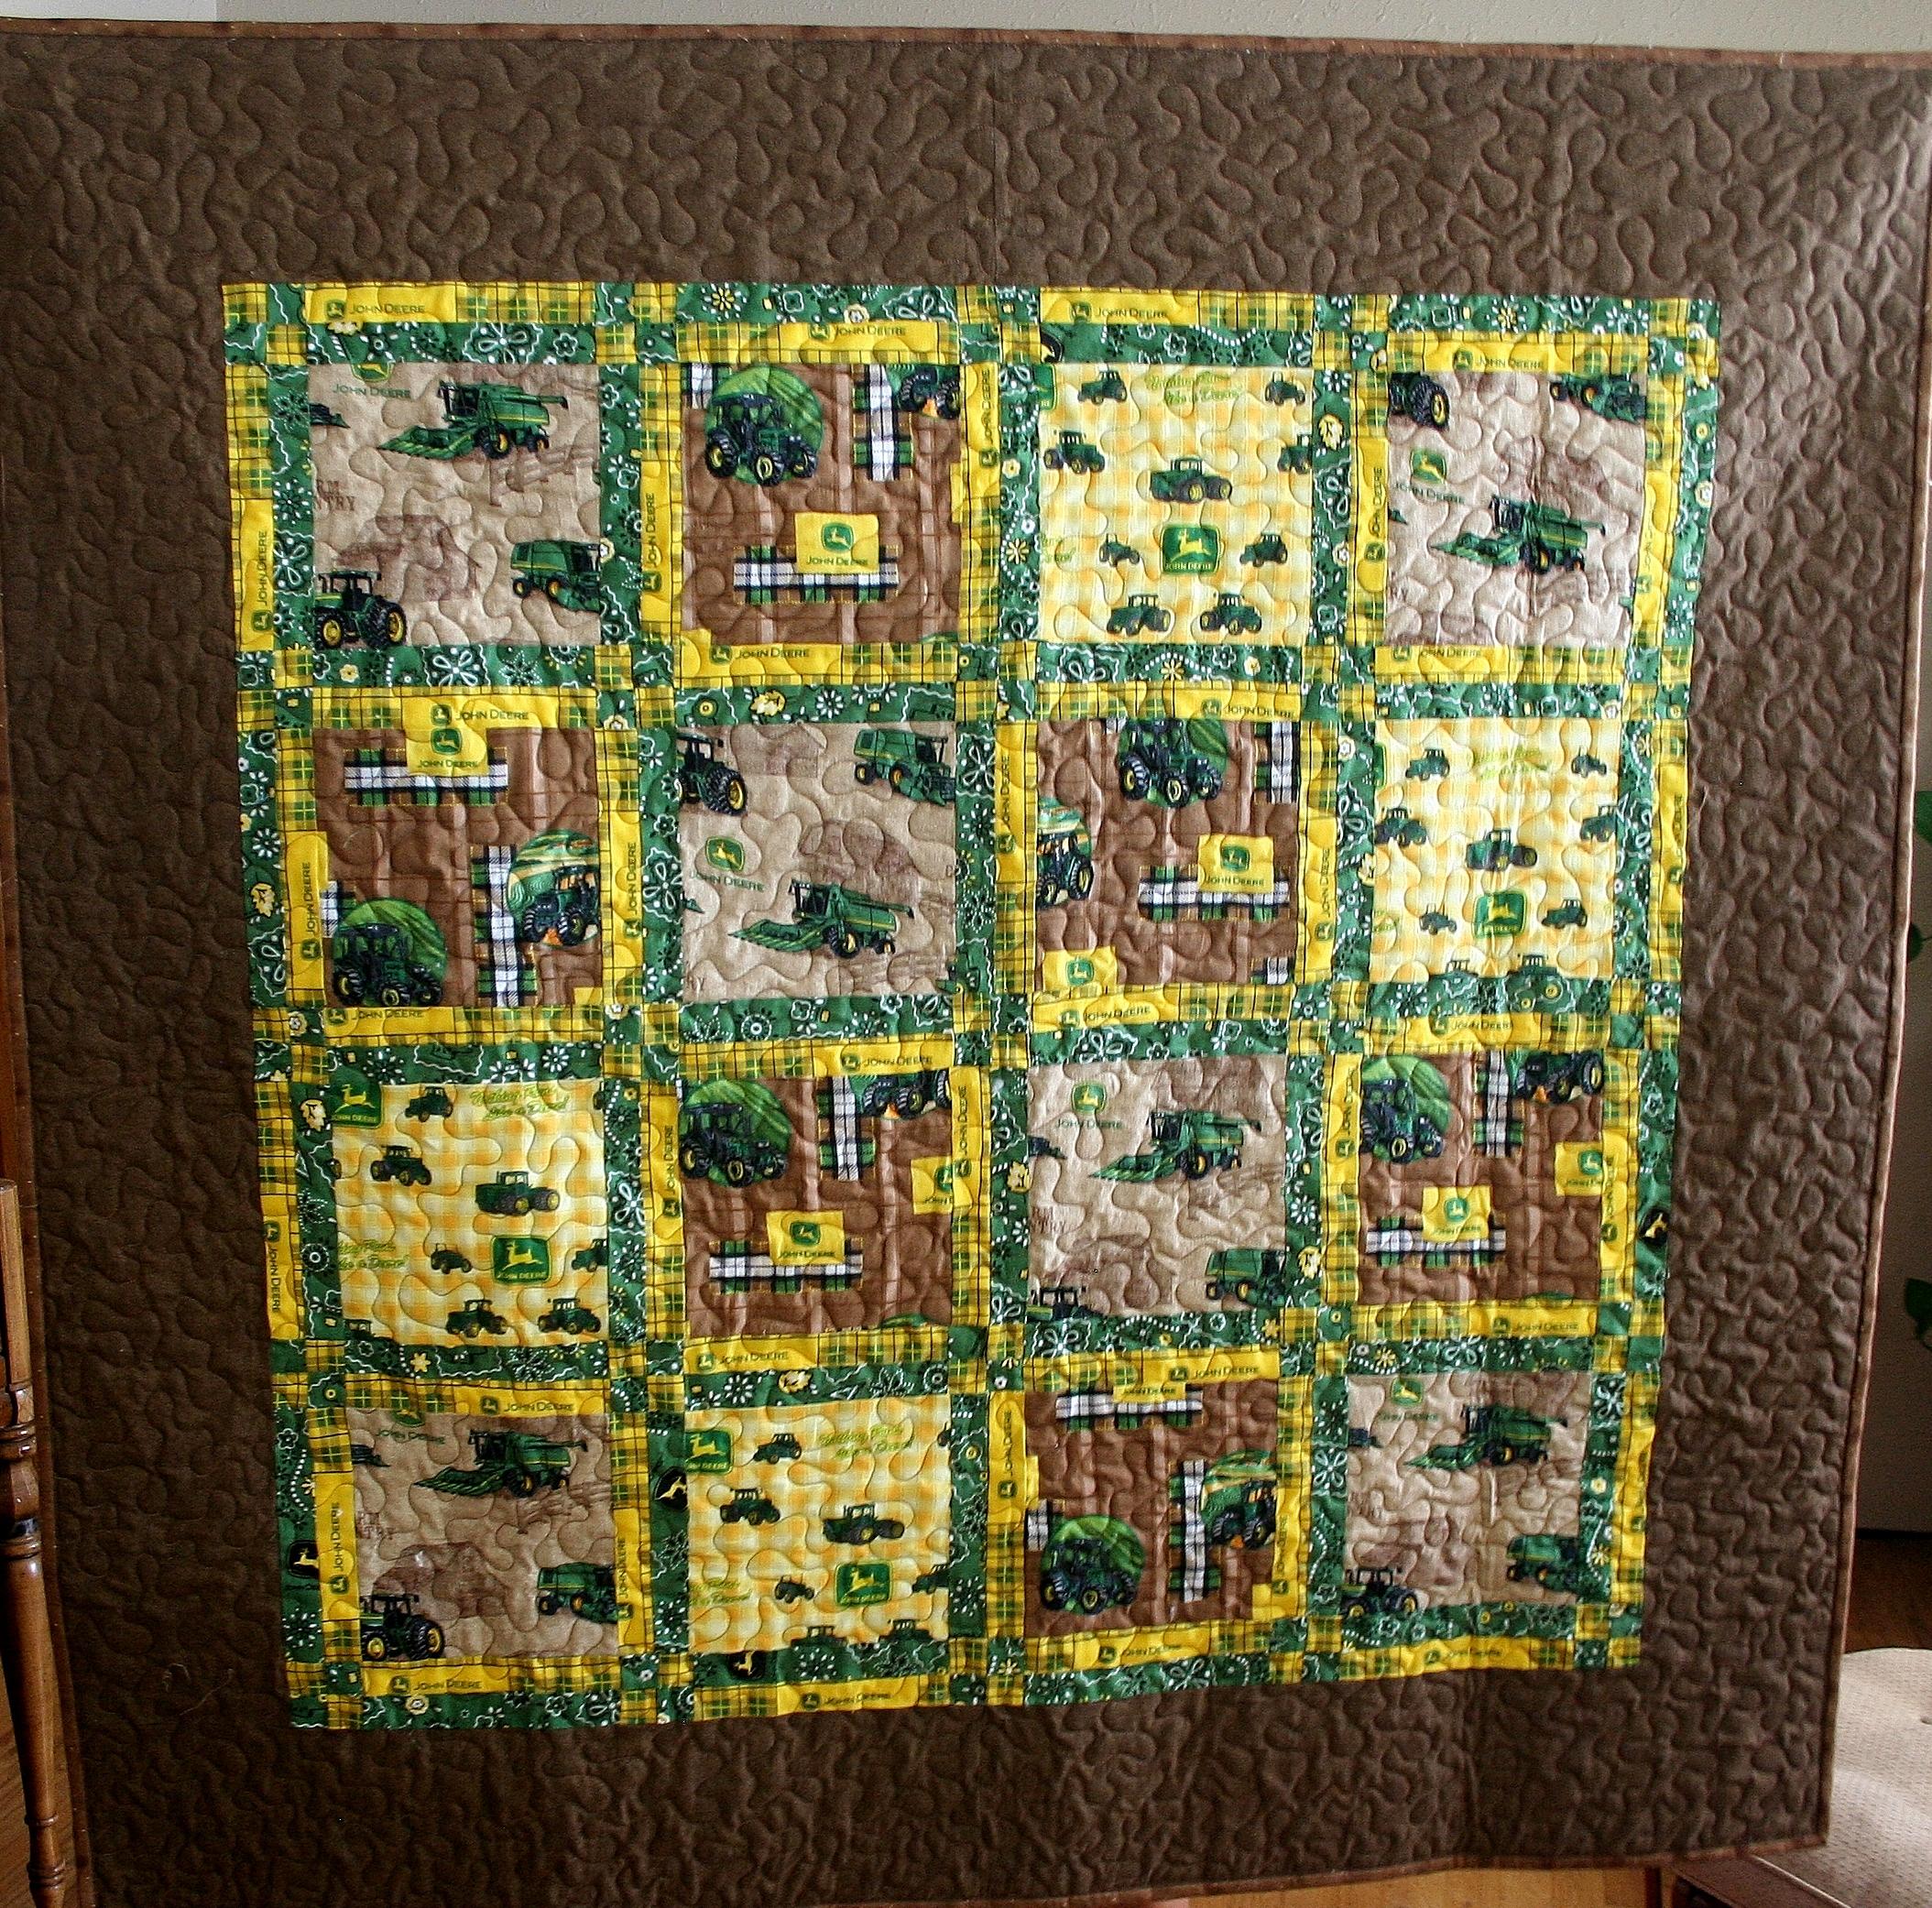 John Deere Tractor Quilt | Ideal Stitches Longarm Quilting ... : john deere quilts - Adamdwight.com